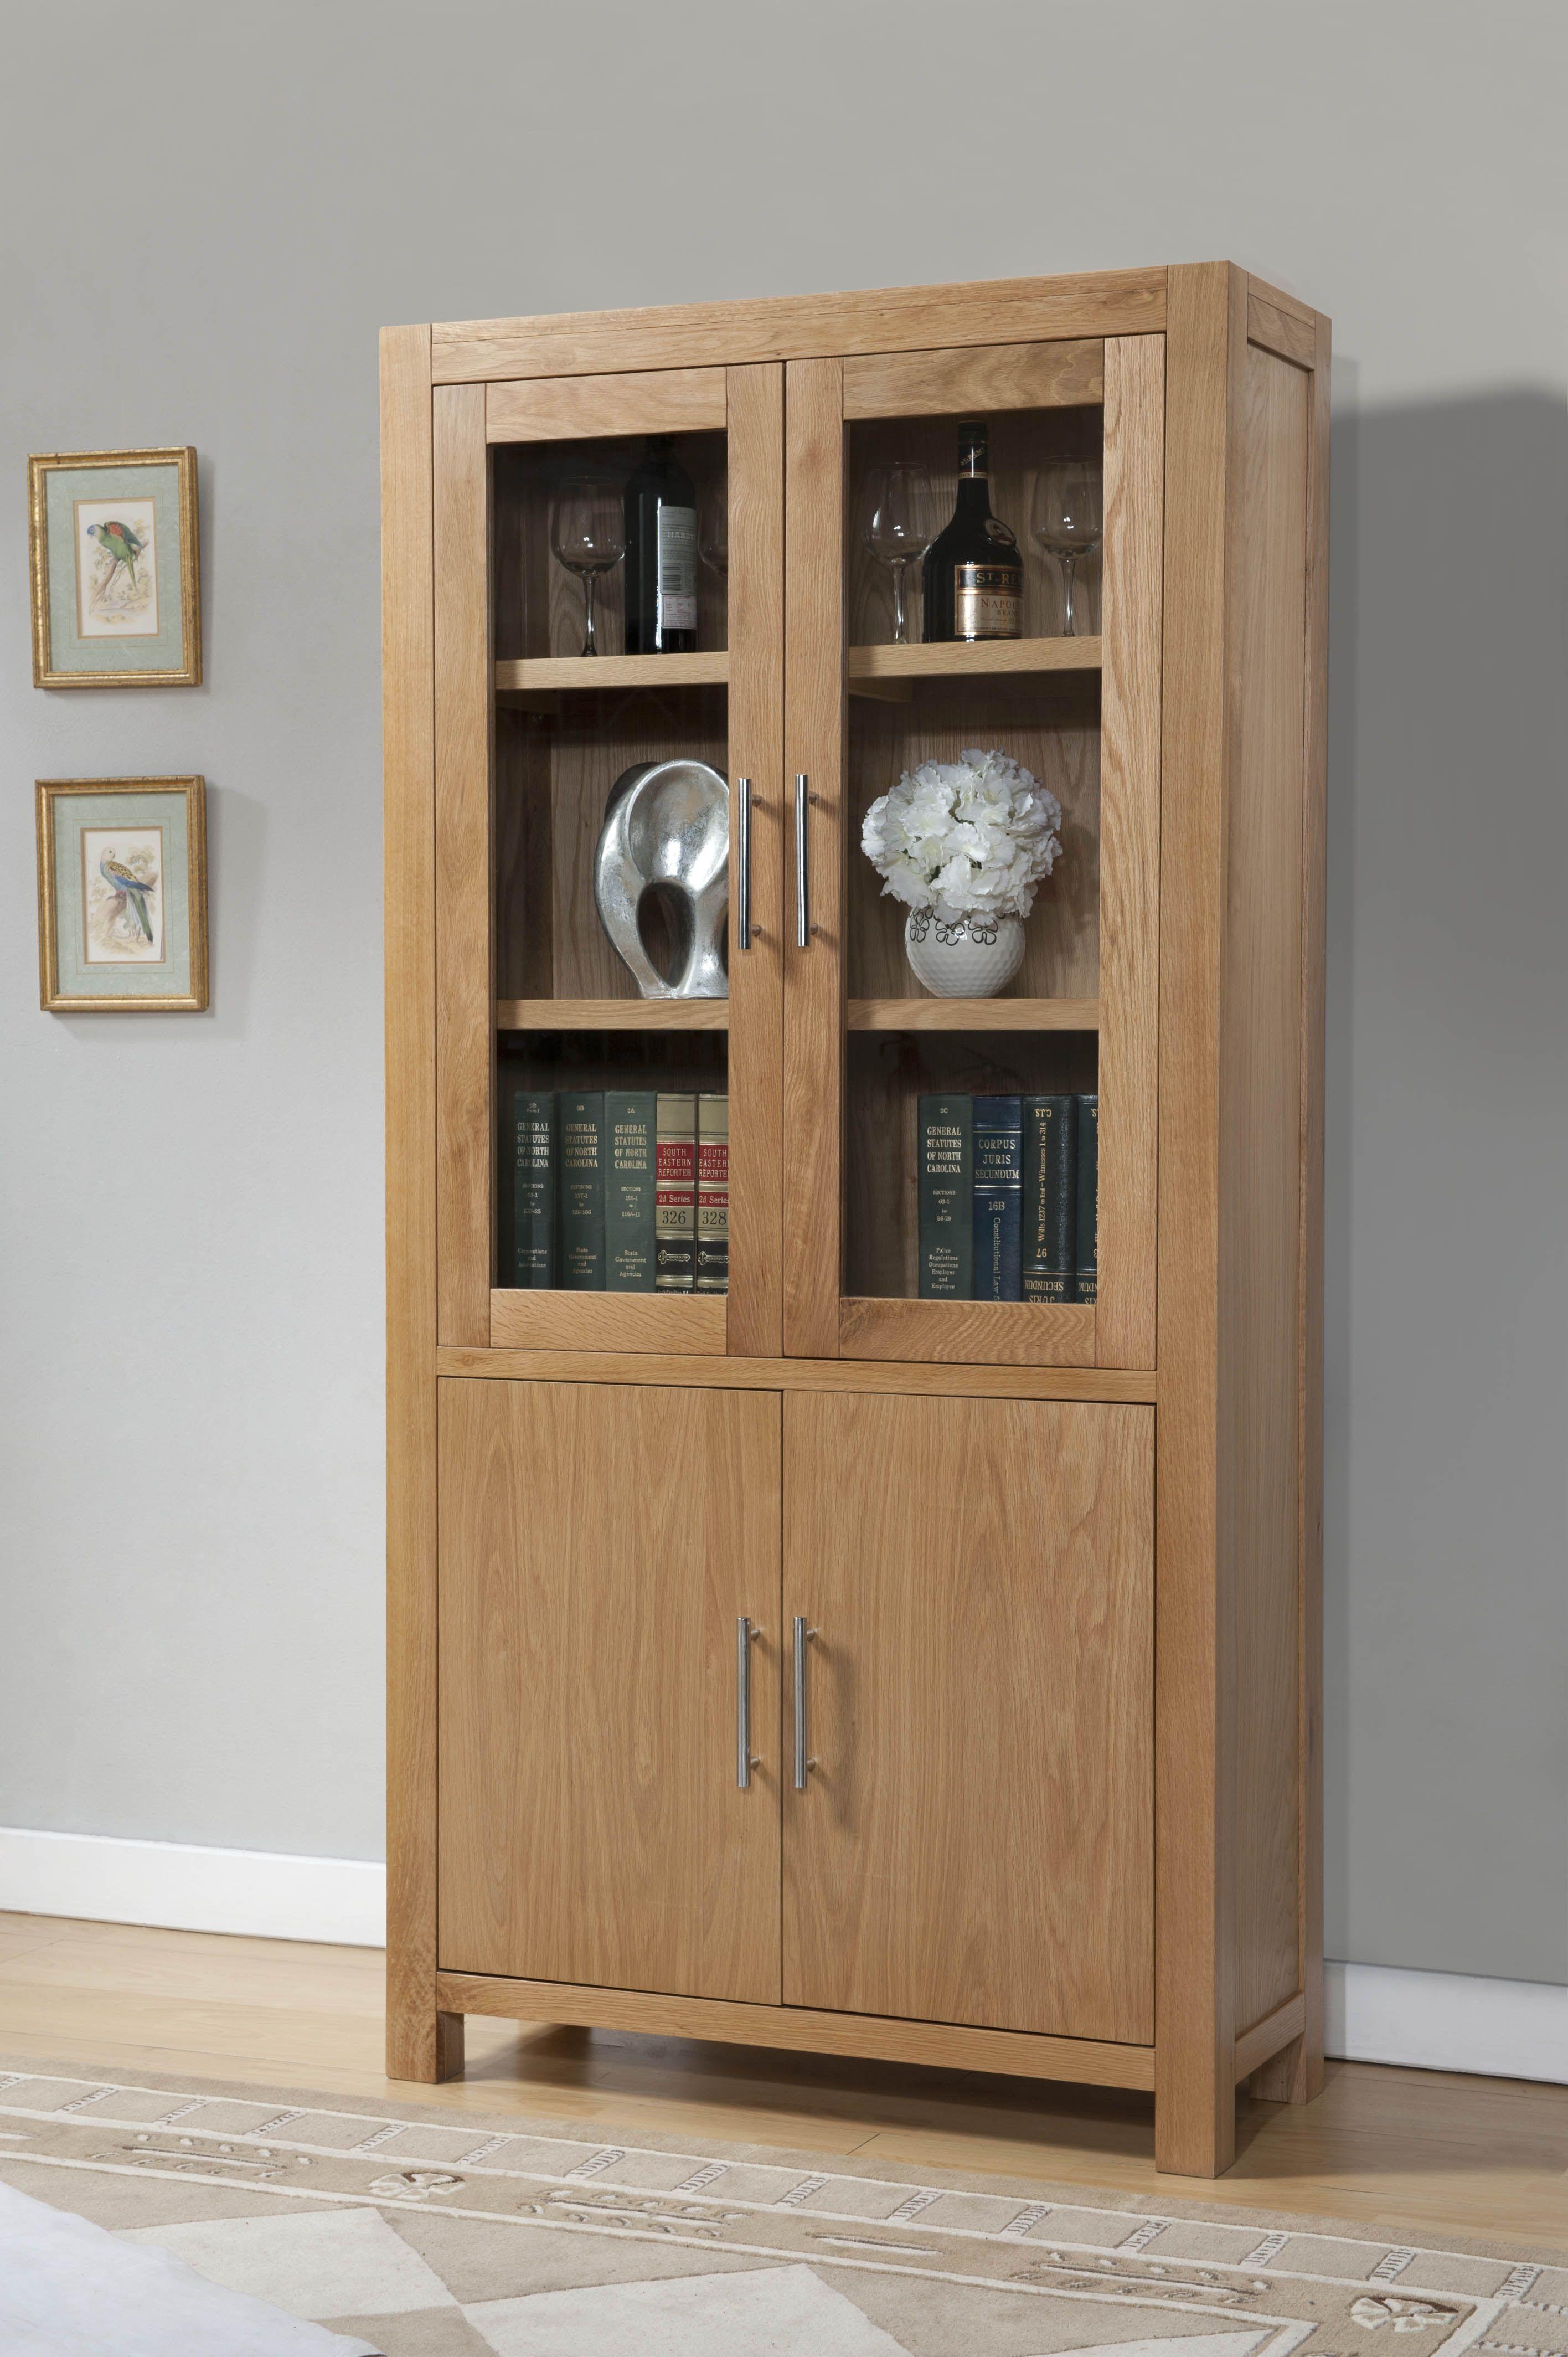 Birstall Oak Interior Furniture Modern Display Cabinet. Milano Oak Display Cabinet  Milano Oak Display Cabinet